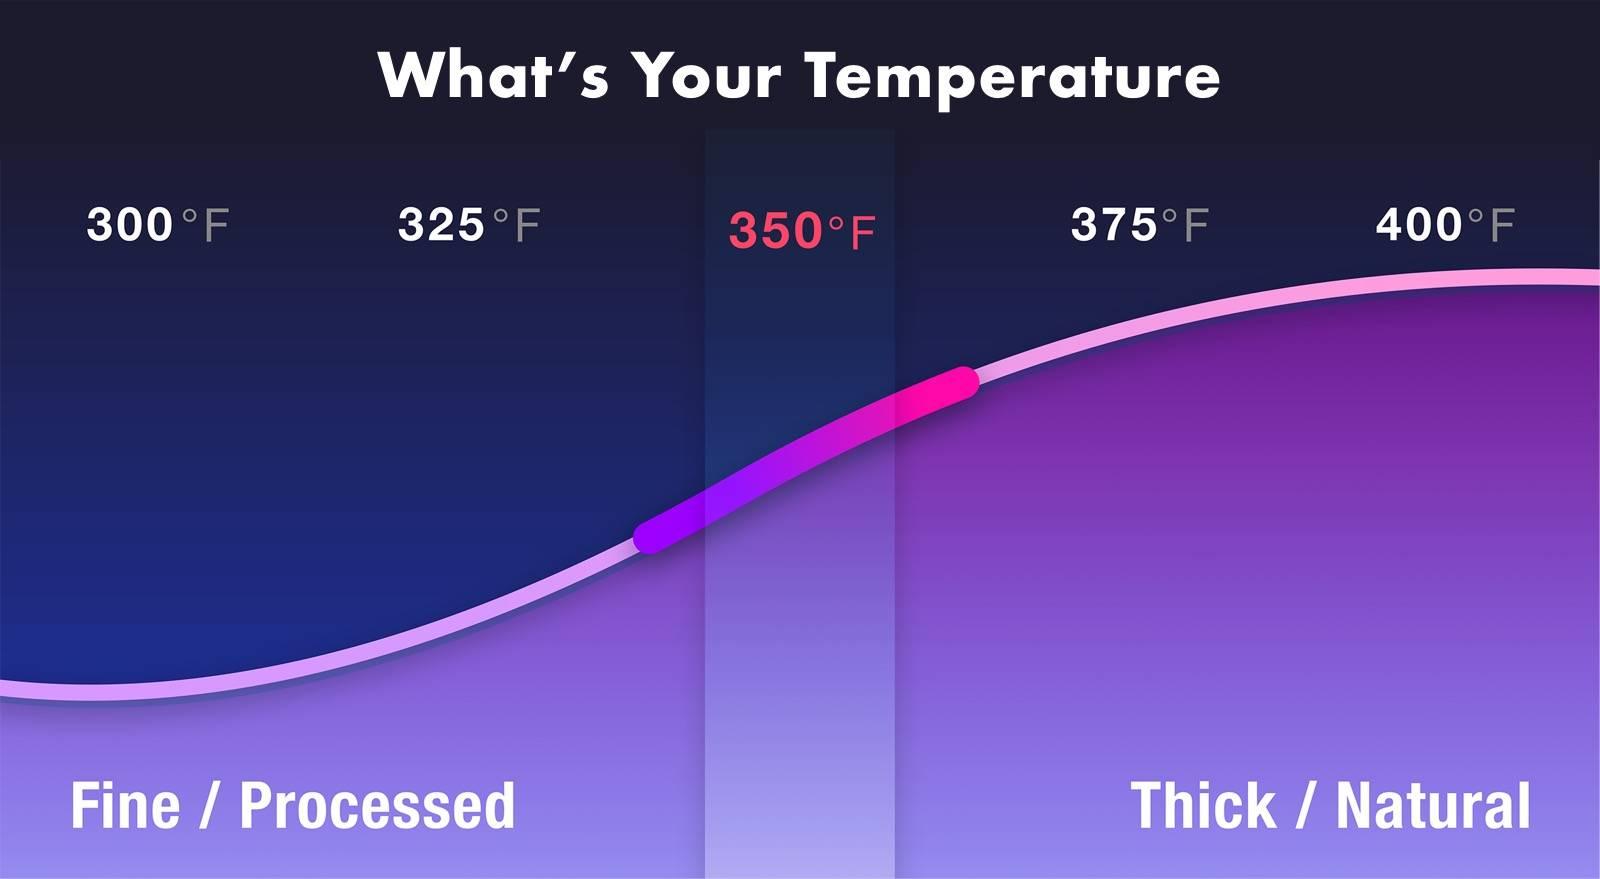 Five temperature settings between 300 and 400 degress